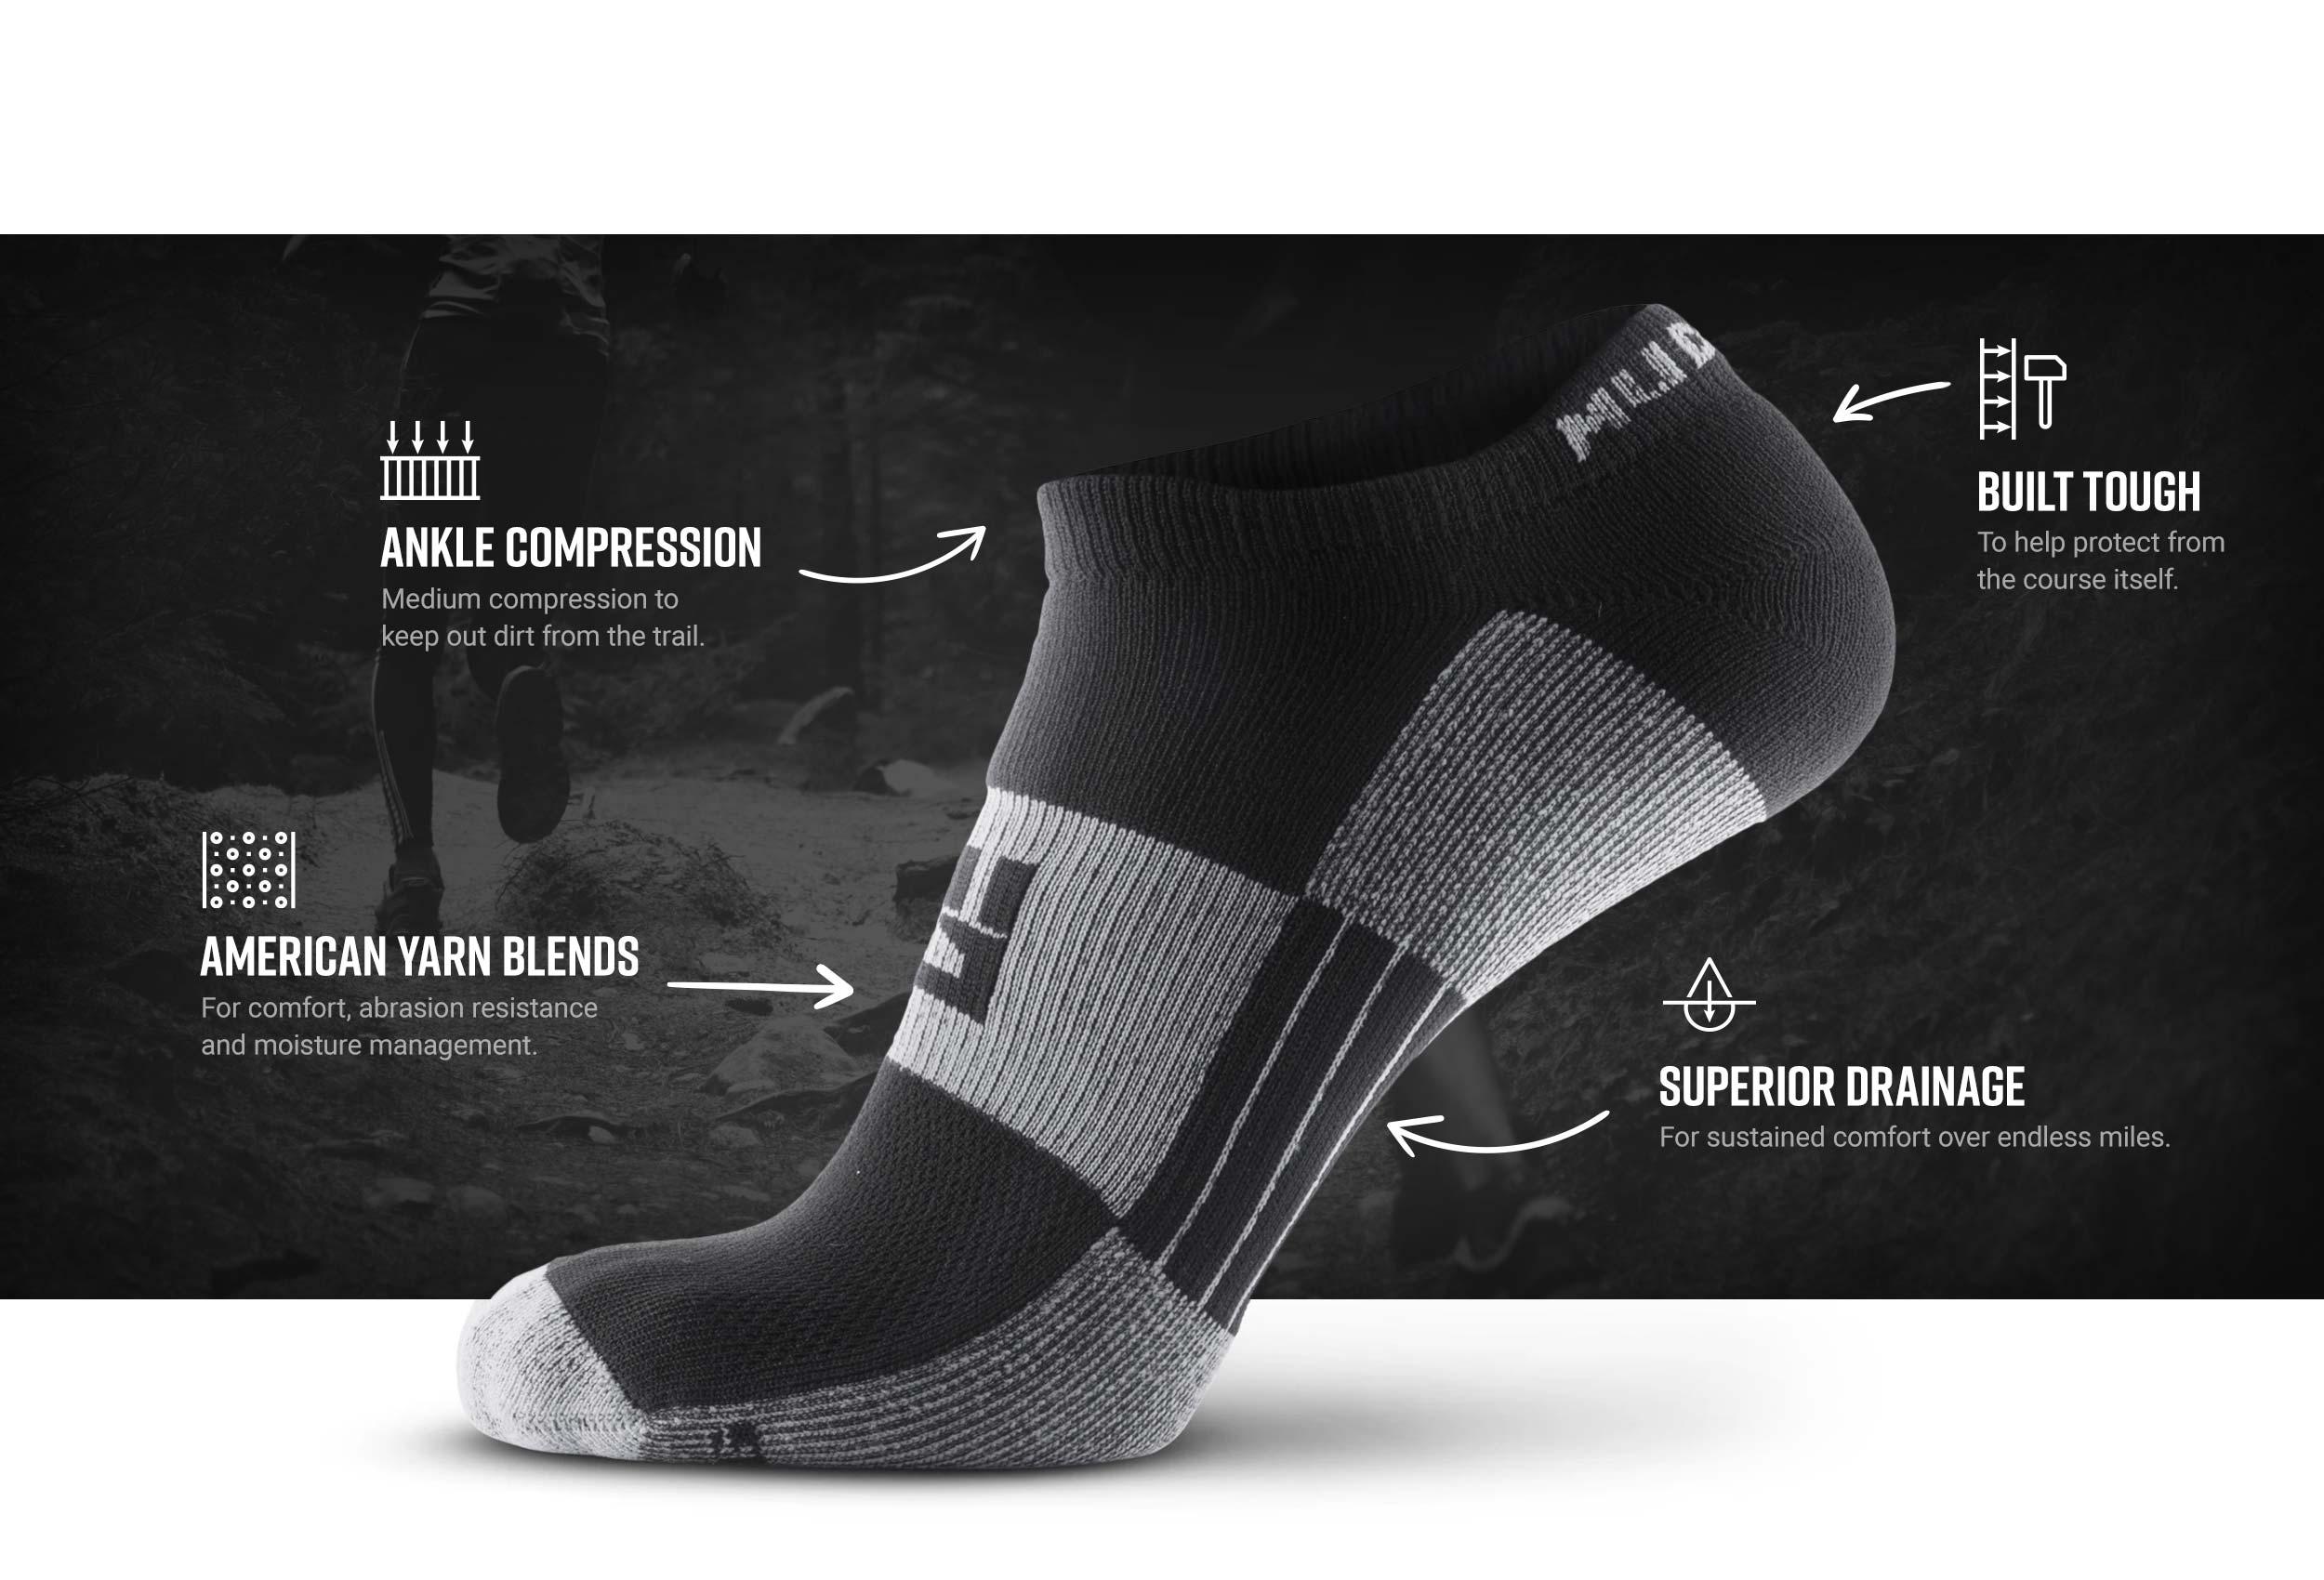 Infographic of No-Show Running Socks - Black/Gray (2 Pair Pack)